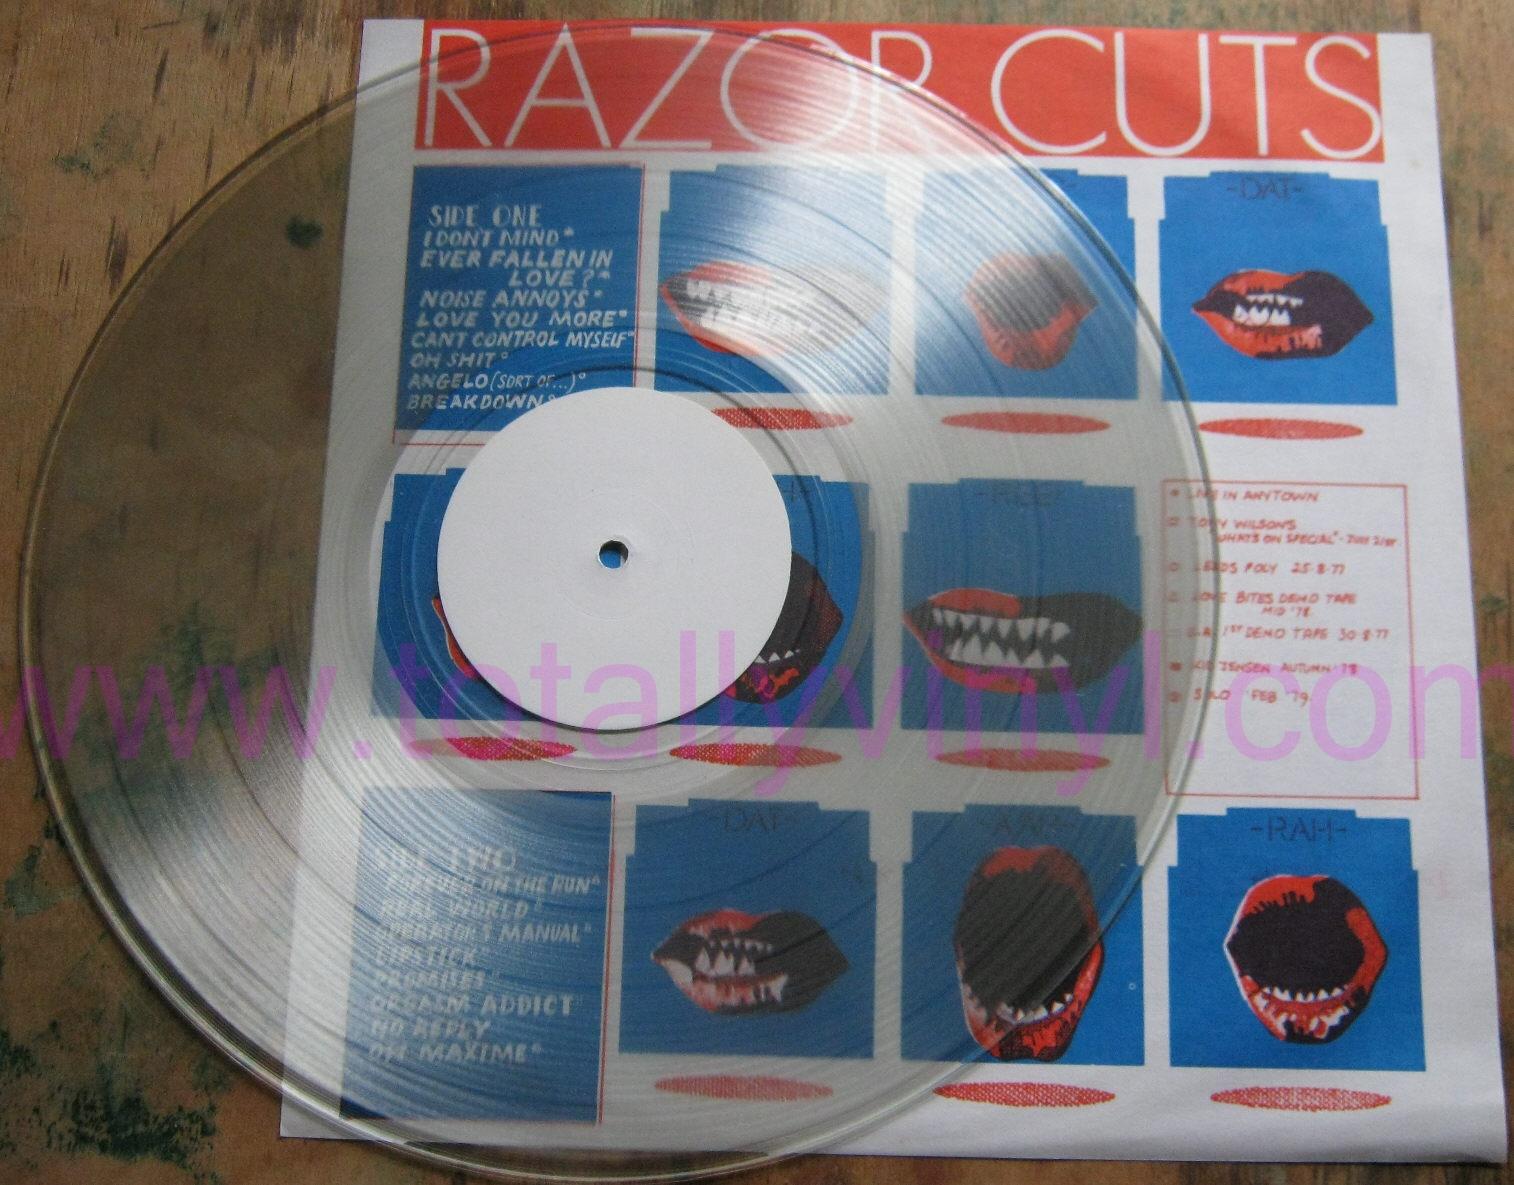 Buzzcocks Razor Cuts